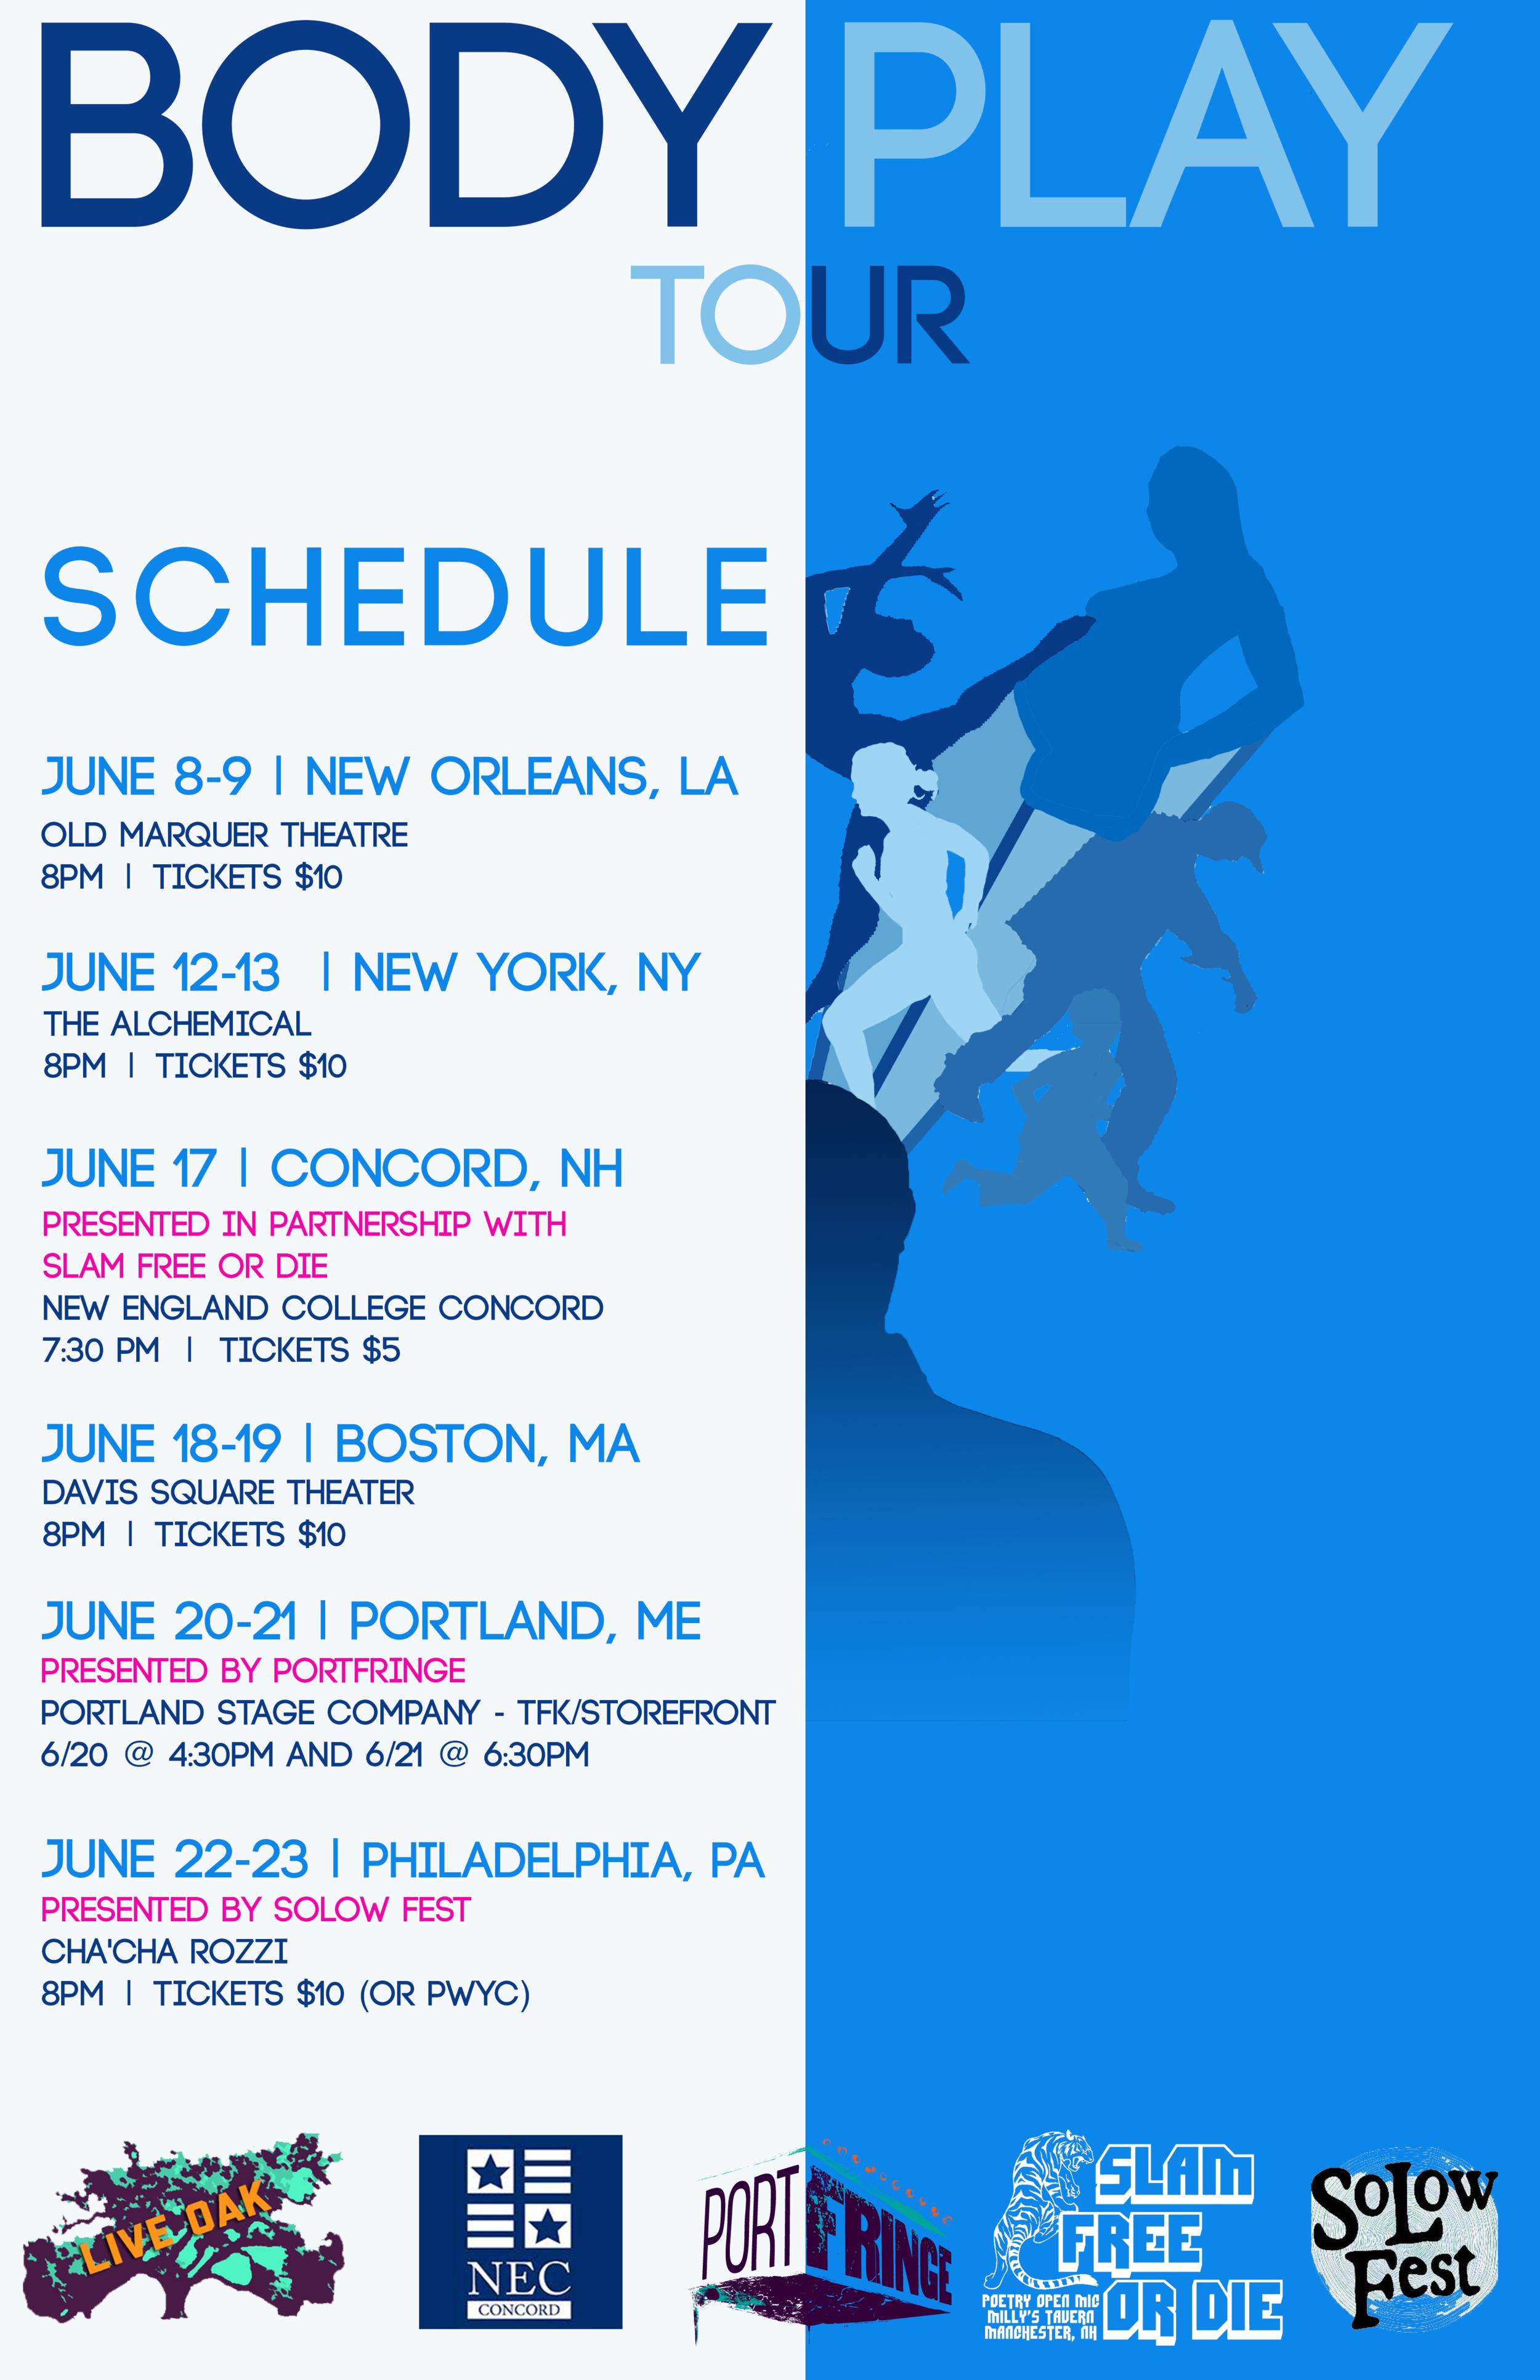 BODY Play Tour Poster, 2015